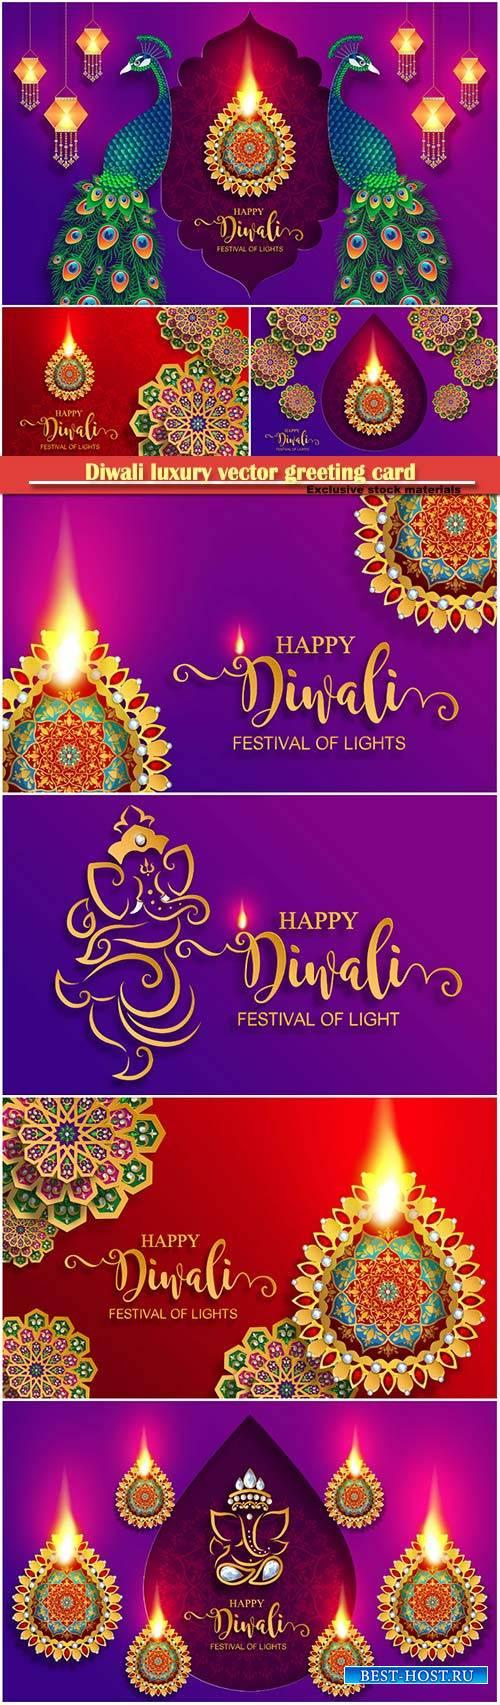 Diwali luxury vector greeting card # 3